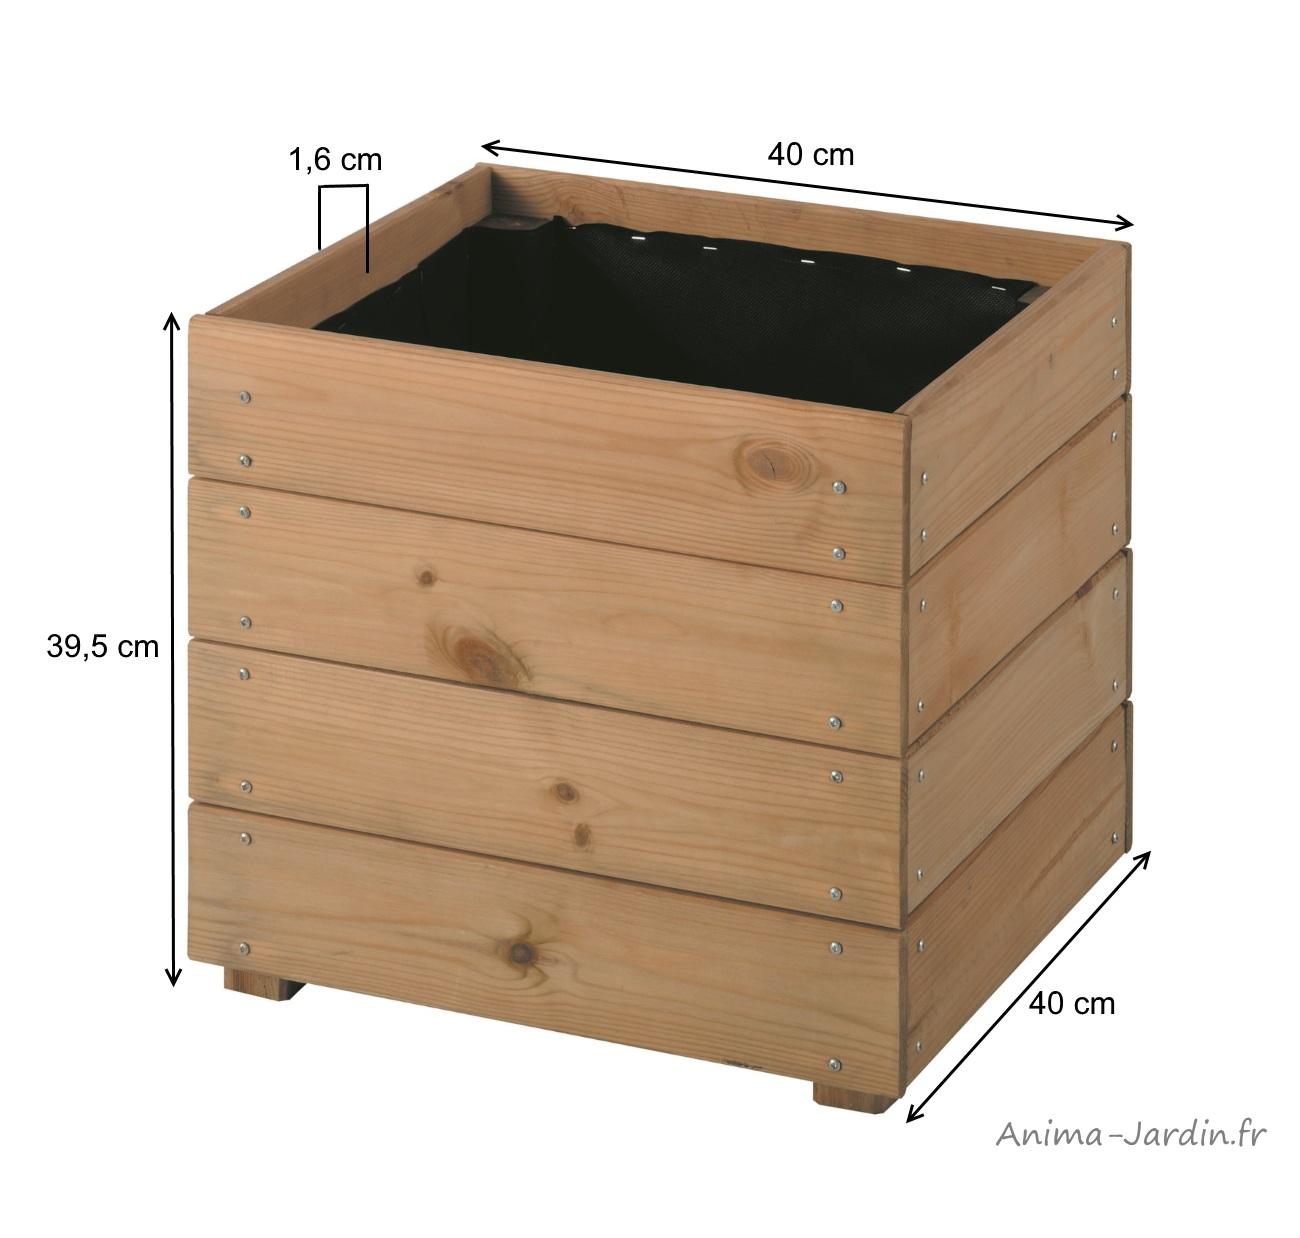 bac-carré-essencia-40cm-bois autoclave-dimensions-anima-jardin.fr